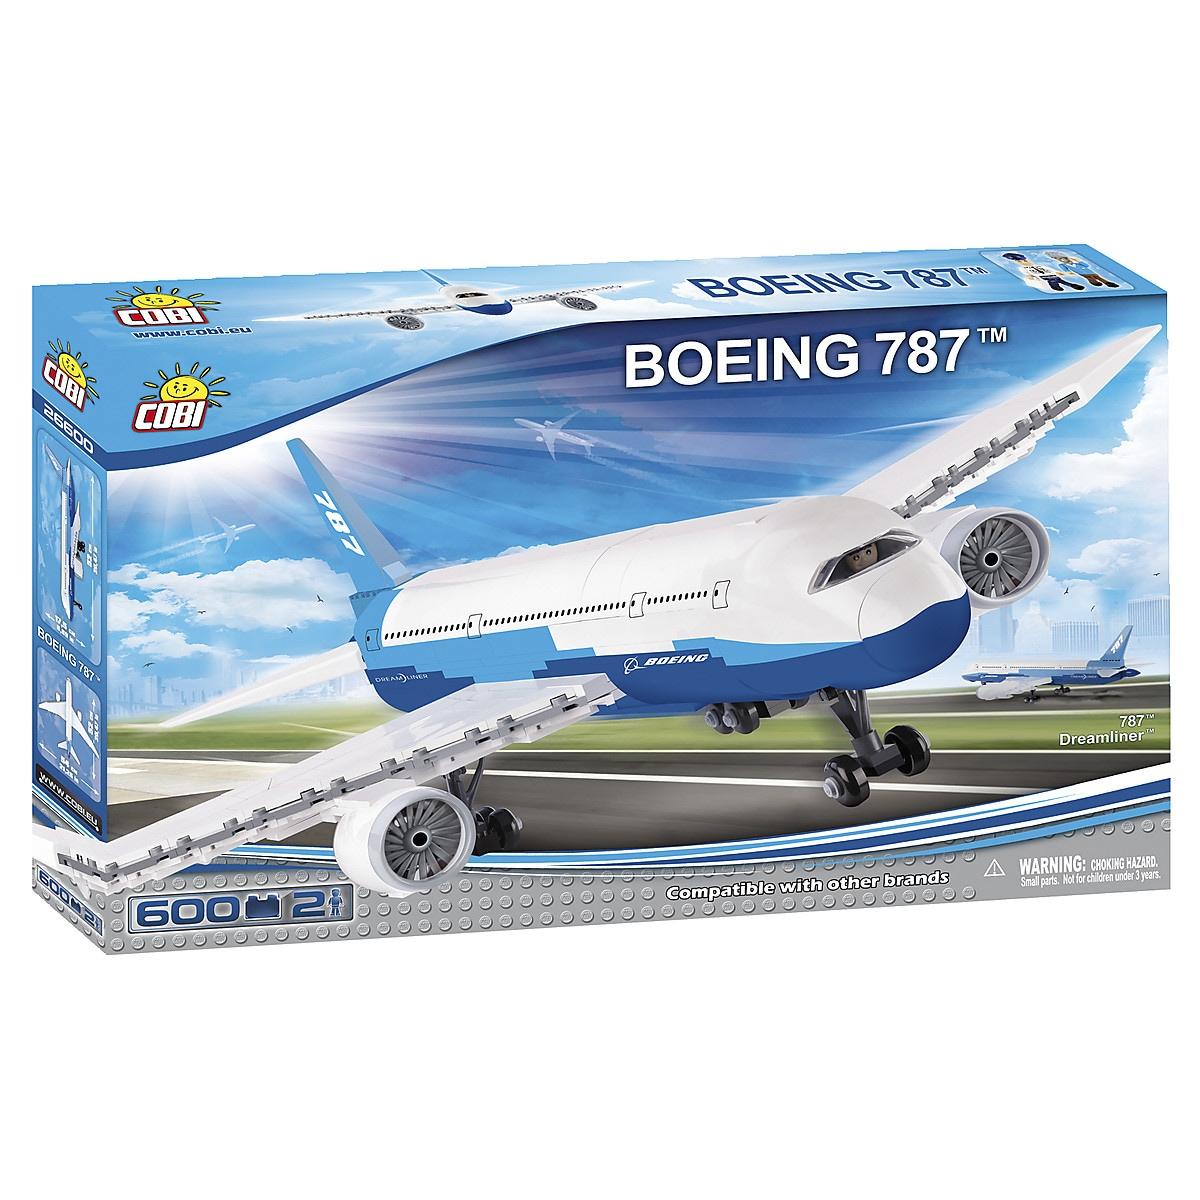 Byggklossar flygplanet Boeing 787 Cobi